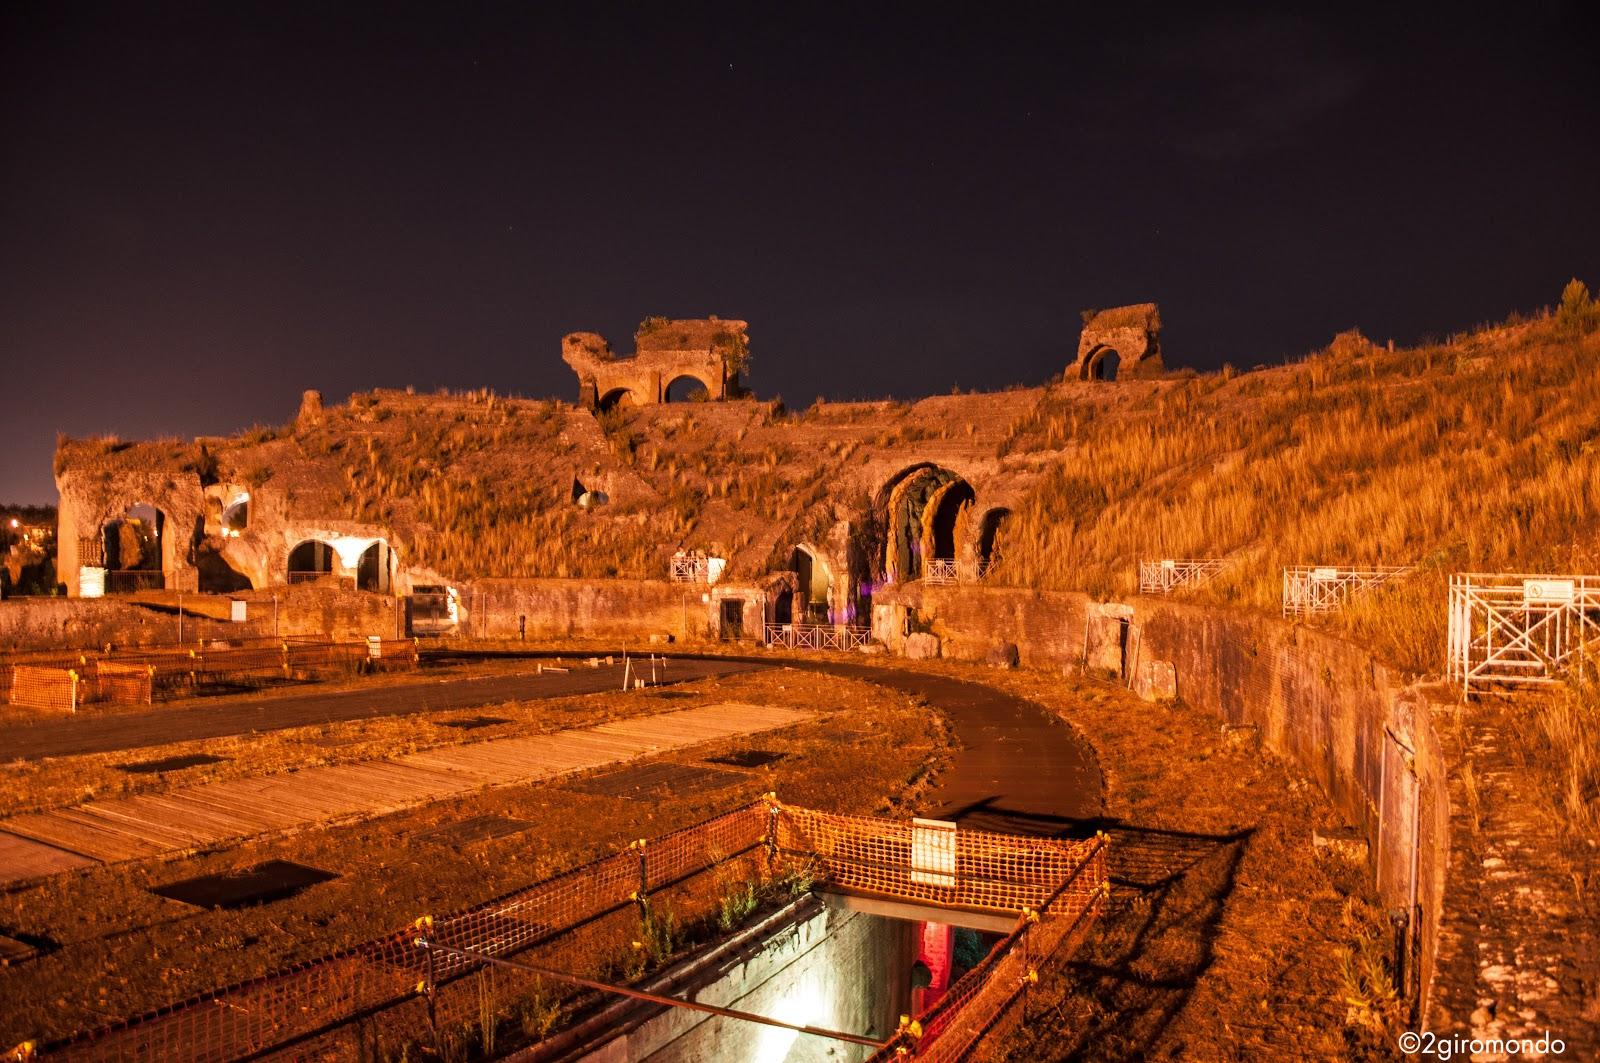 Inside Amphitheatre of Santa Maria Capua Vetere